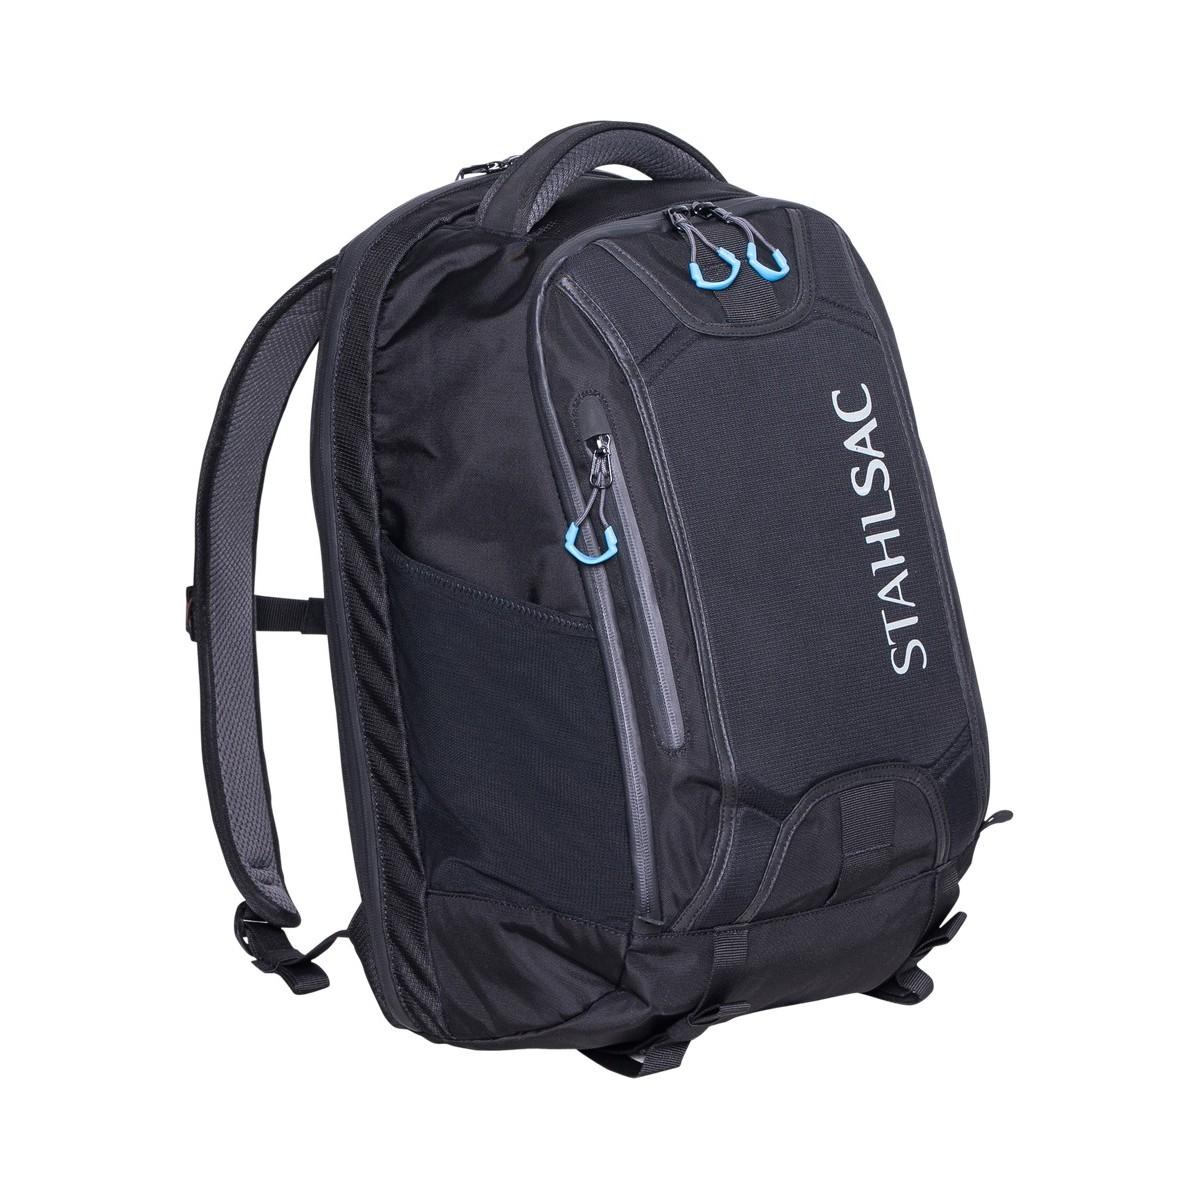 Stahlsac Steel Backpack Bag